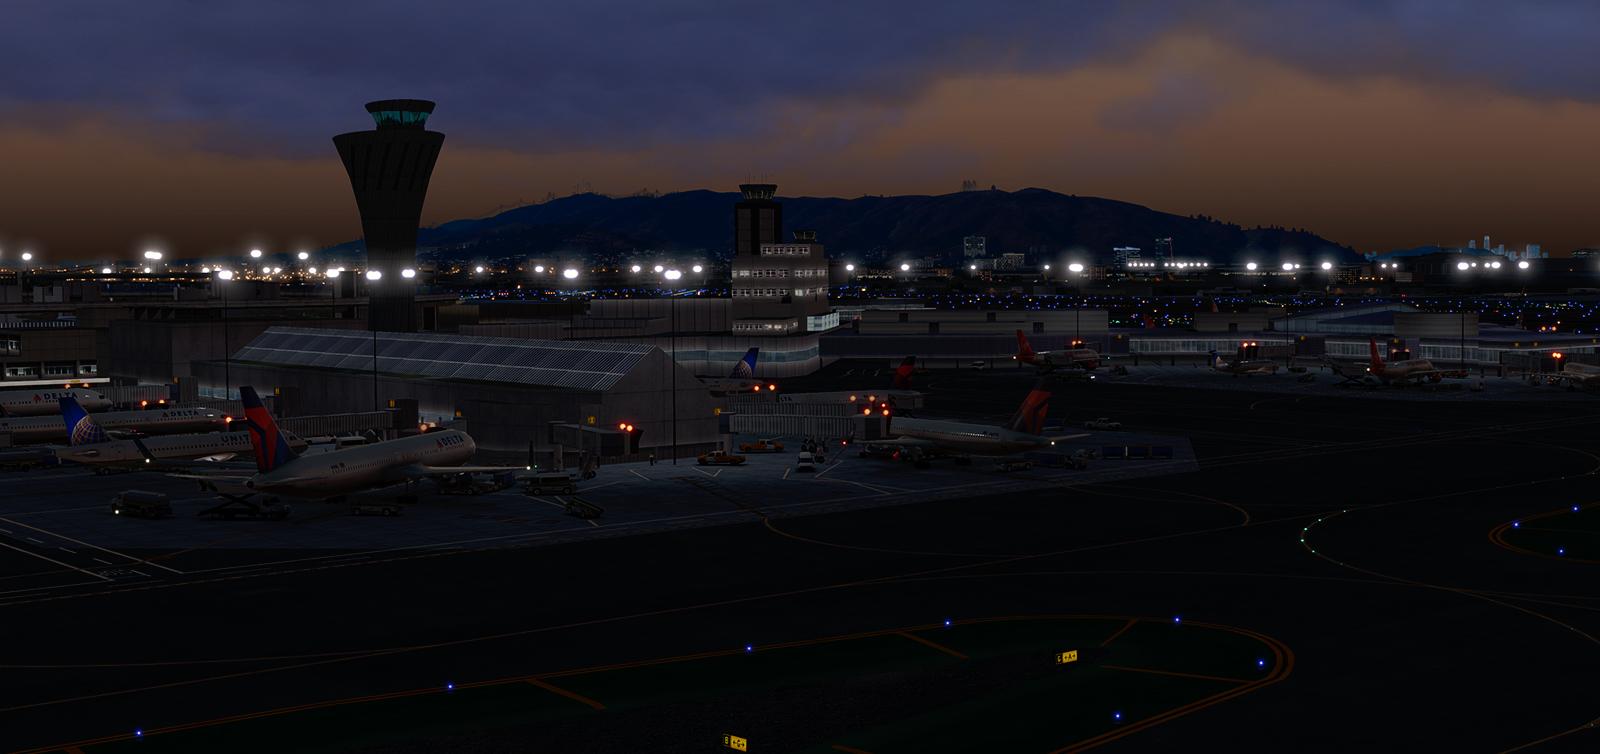 A320 - 2019-12-14 0121